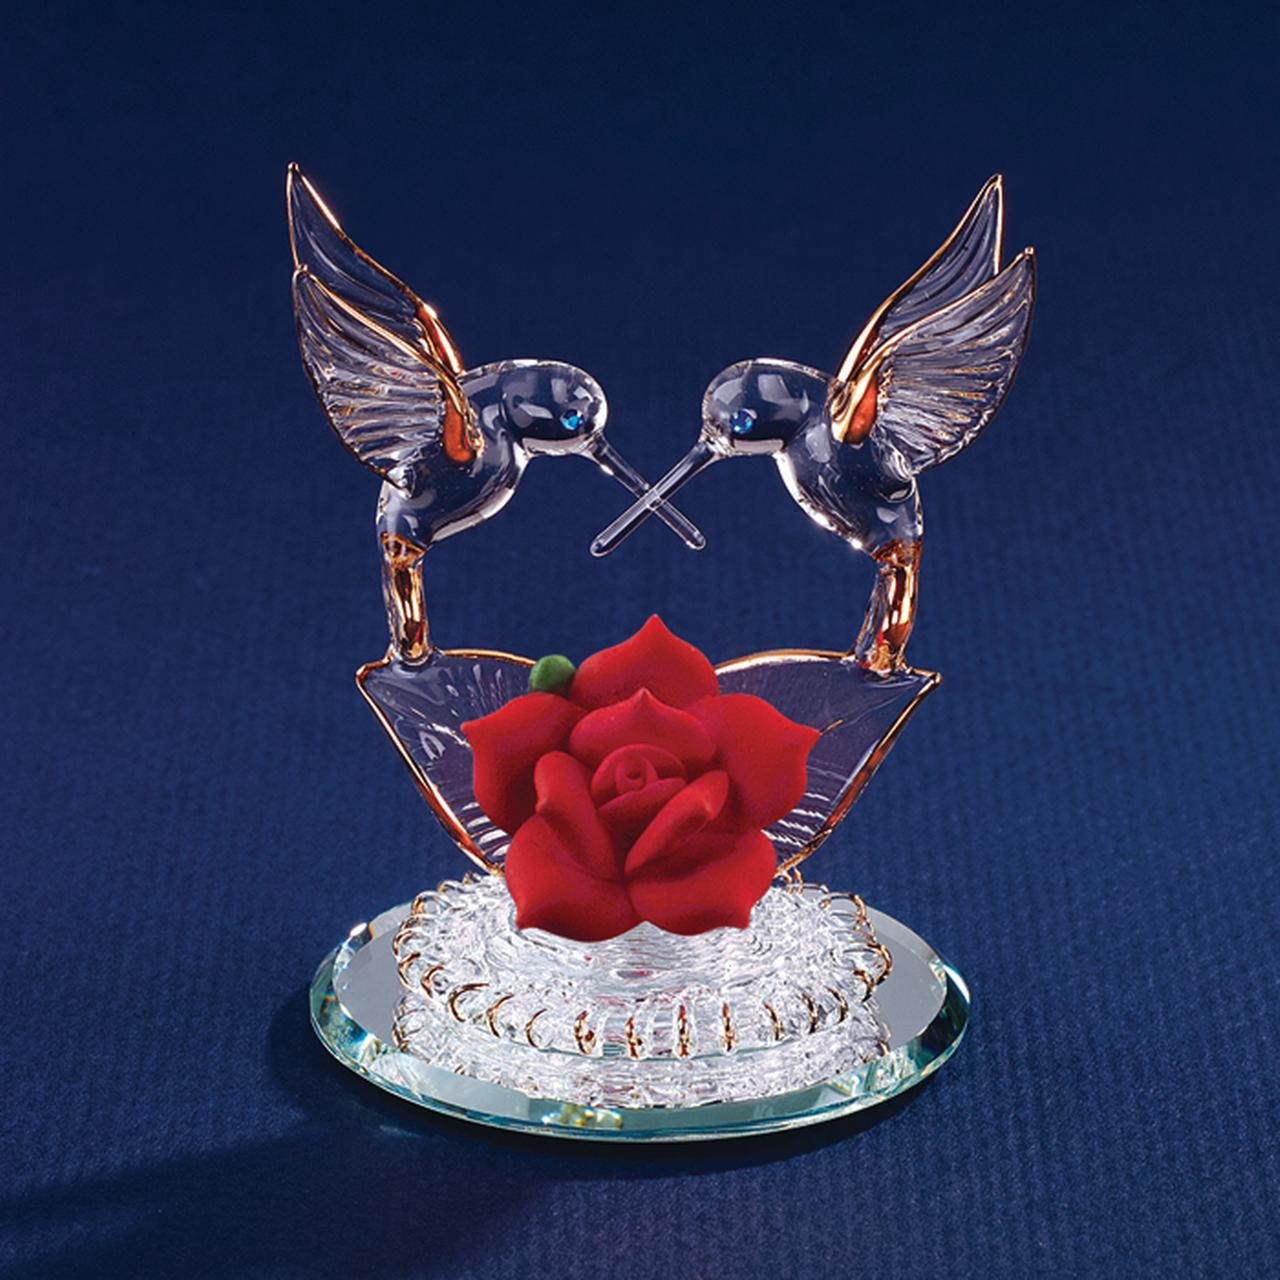 Hummingbirds Red Rose Glass Figurine Floral Garden Nautical Glas Baron For Women